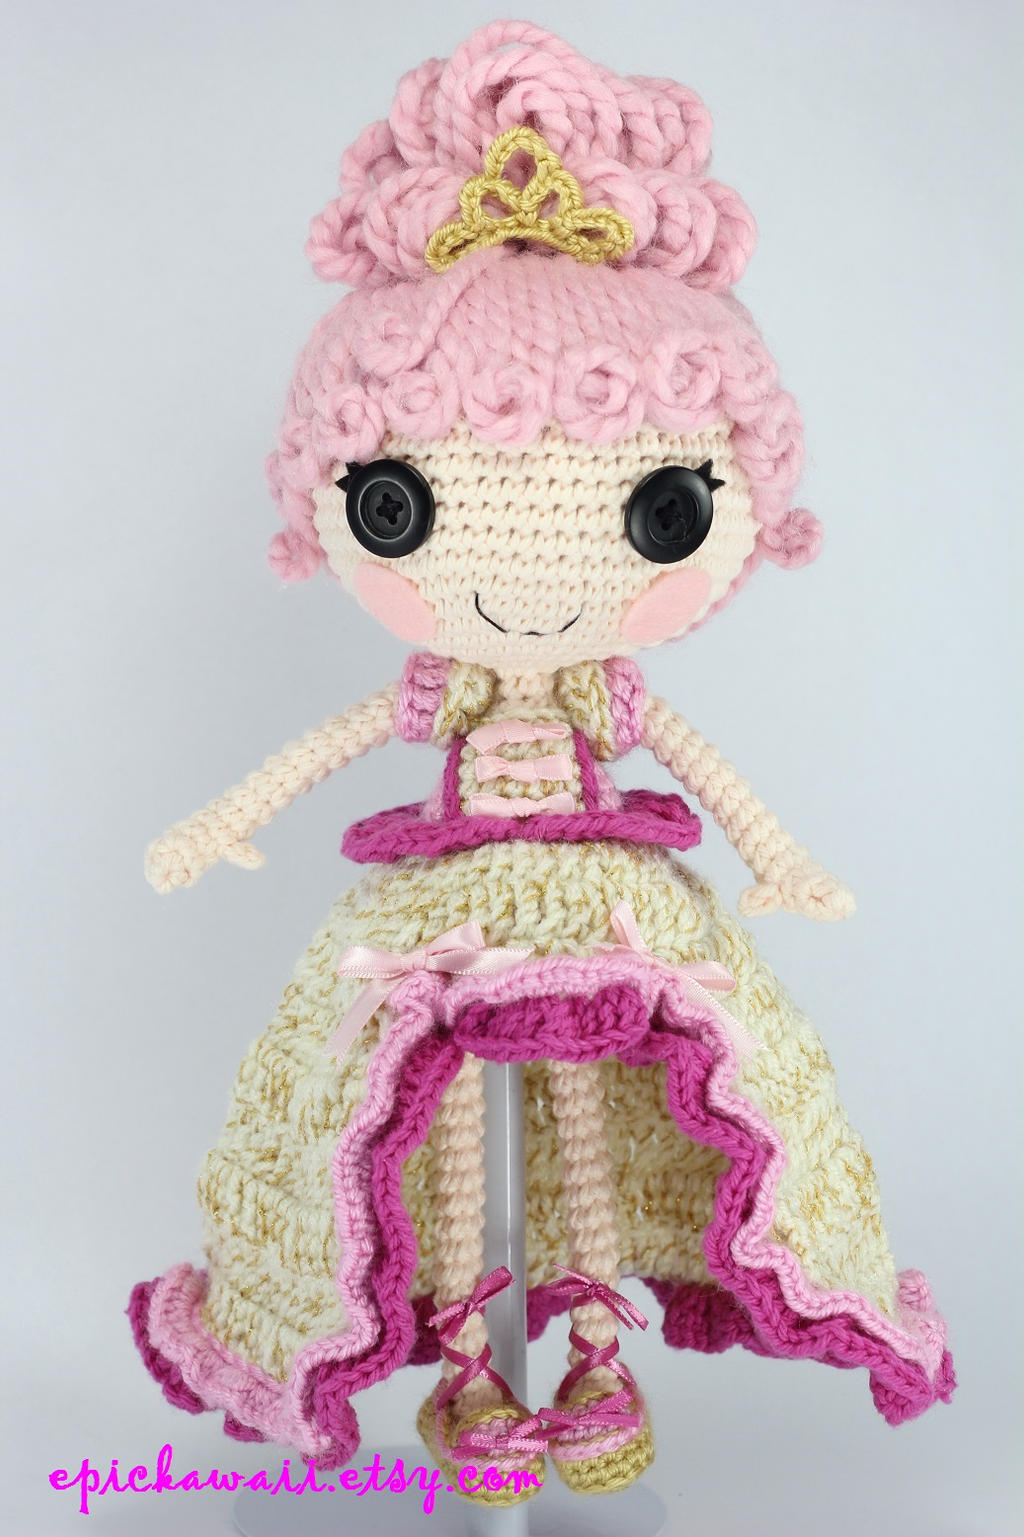 LALALOOPSY Goldie Luxe Crochet Amigurumi Doll by Npantz22 ...